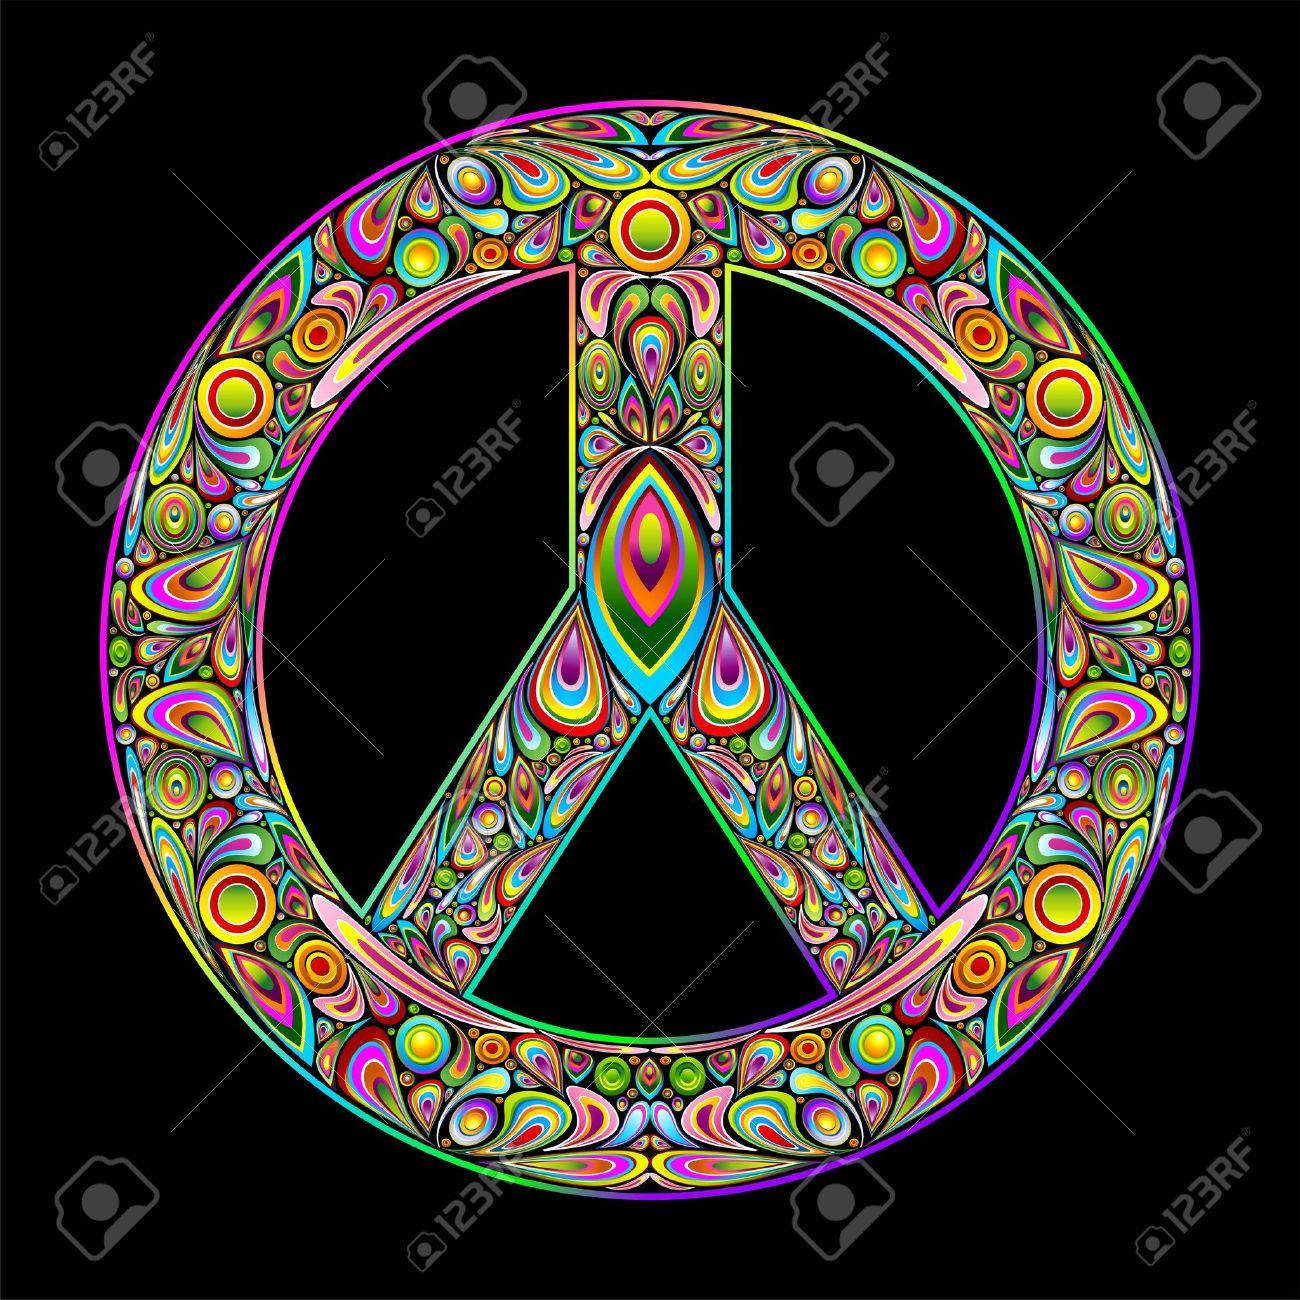 Peace Symbol Psychedelic Art Design Stock Vector - 15906756